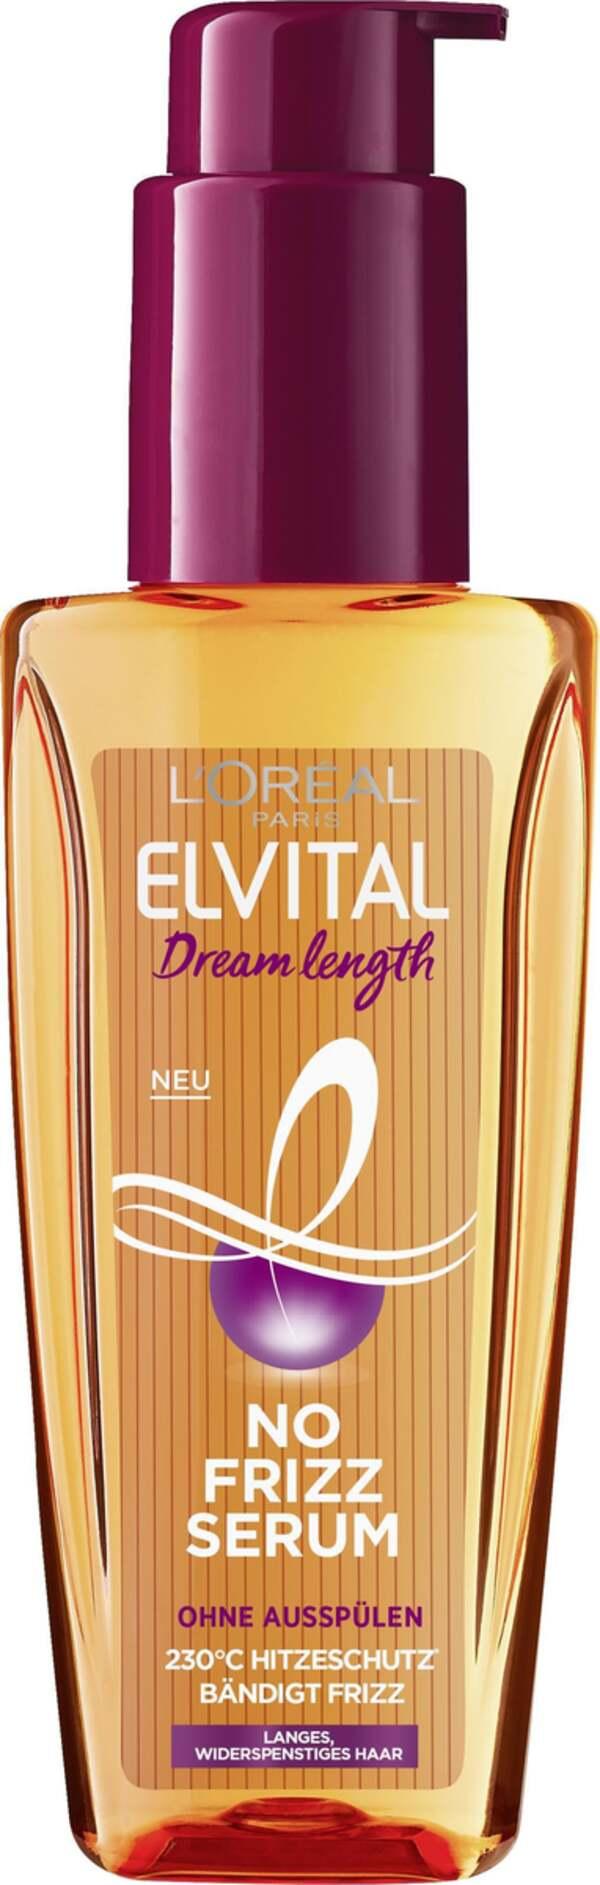 L'Oréal Paris Elvital Dream Length No Frizz Serum